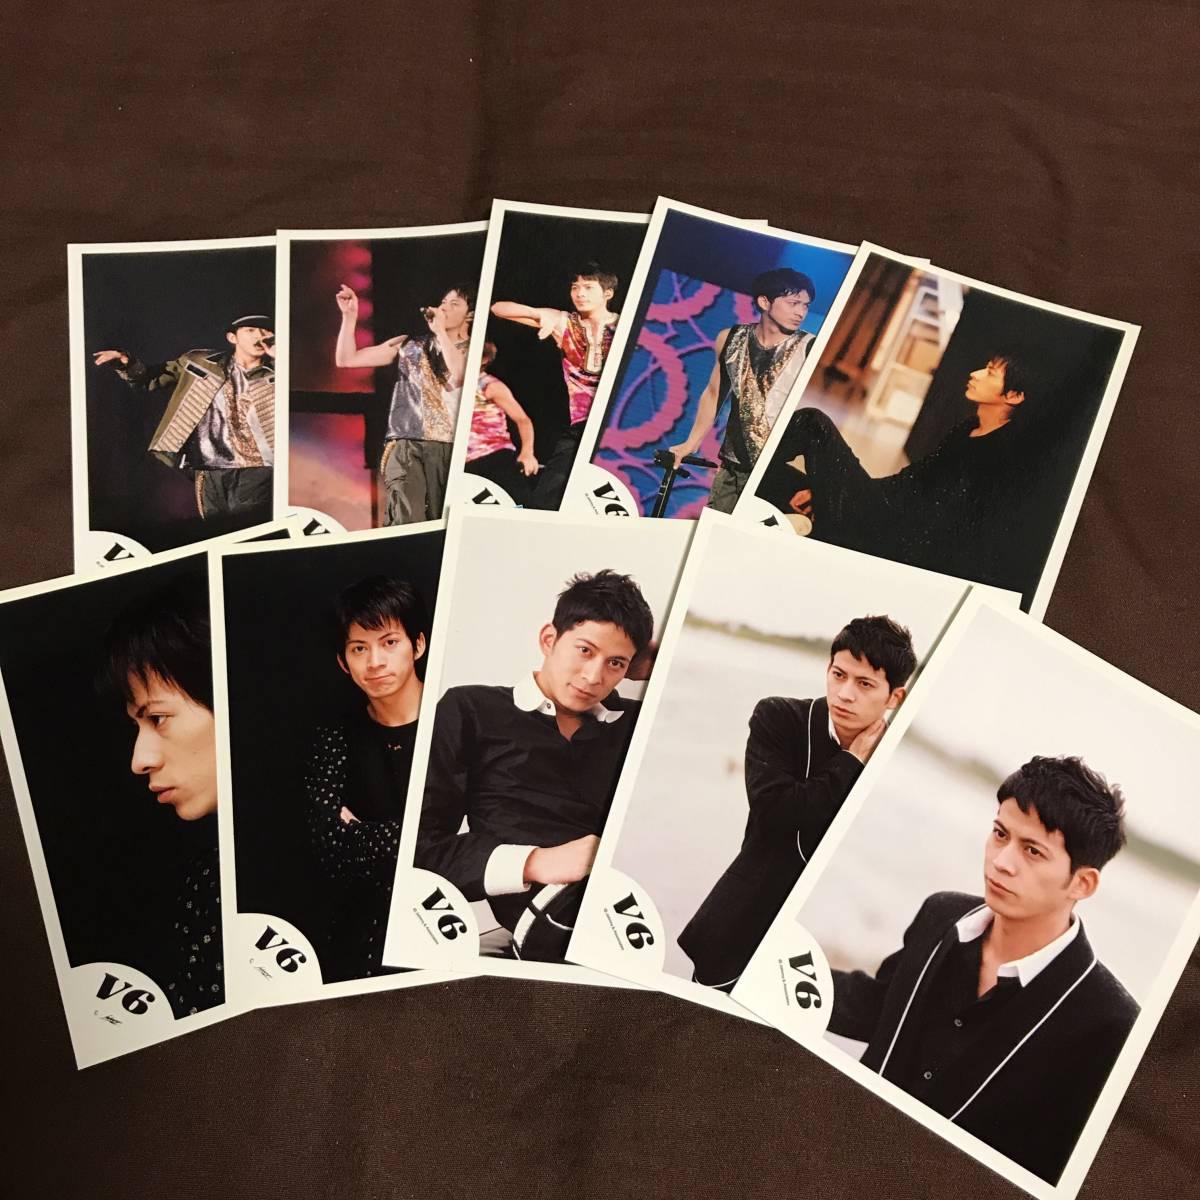 V6 岡田准一 公式写真 写真 ブロマイド グッズ コンサートグッズの画像